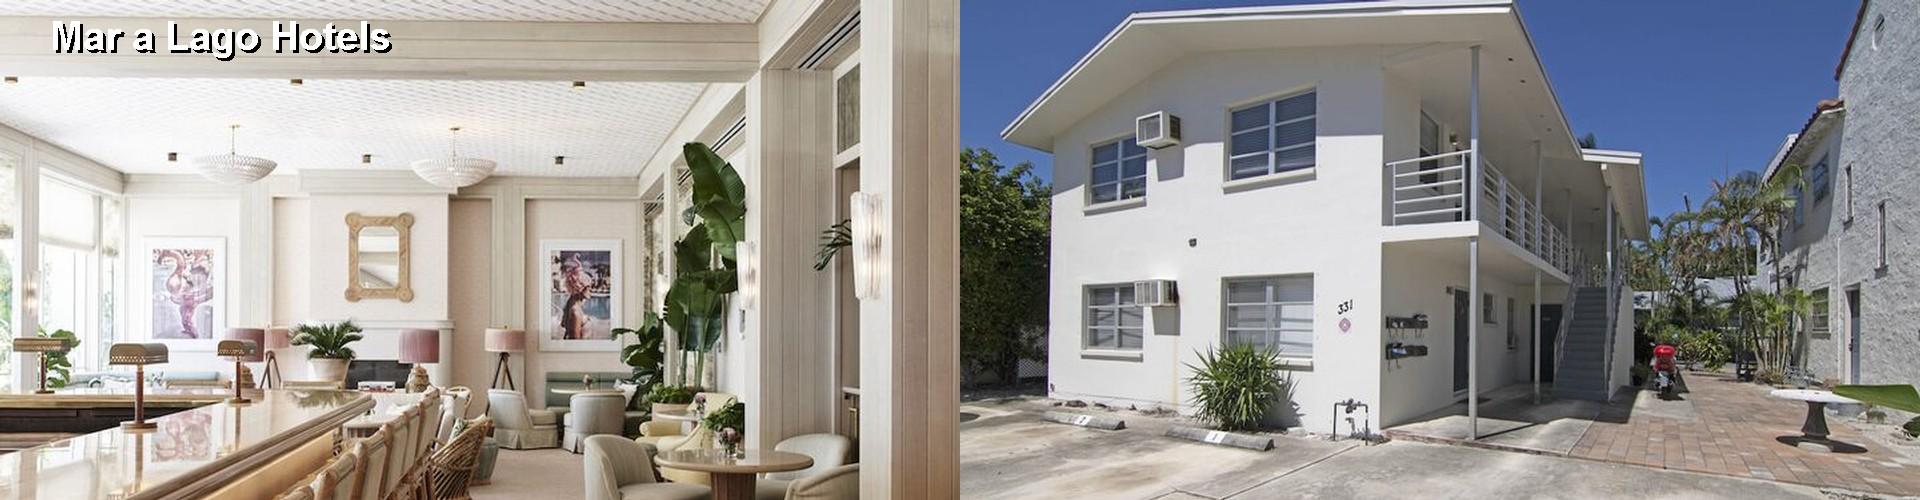 Hotels Near Juno Beach Fl